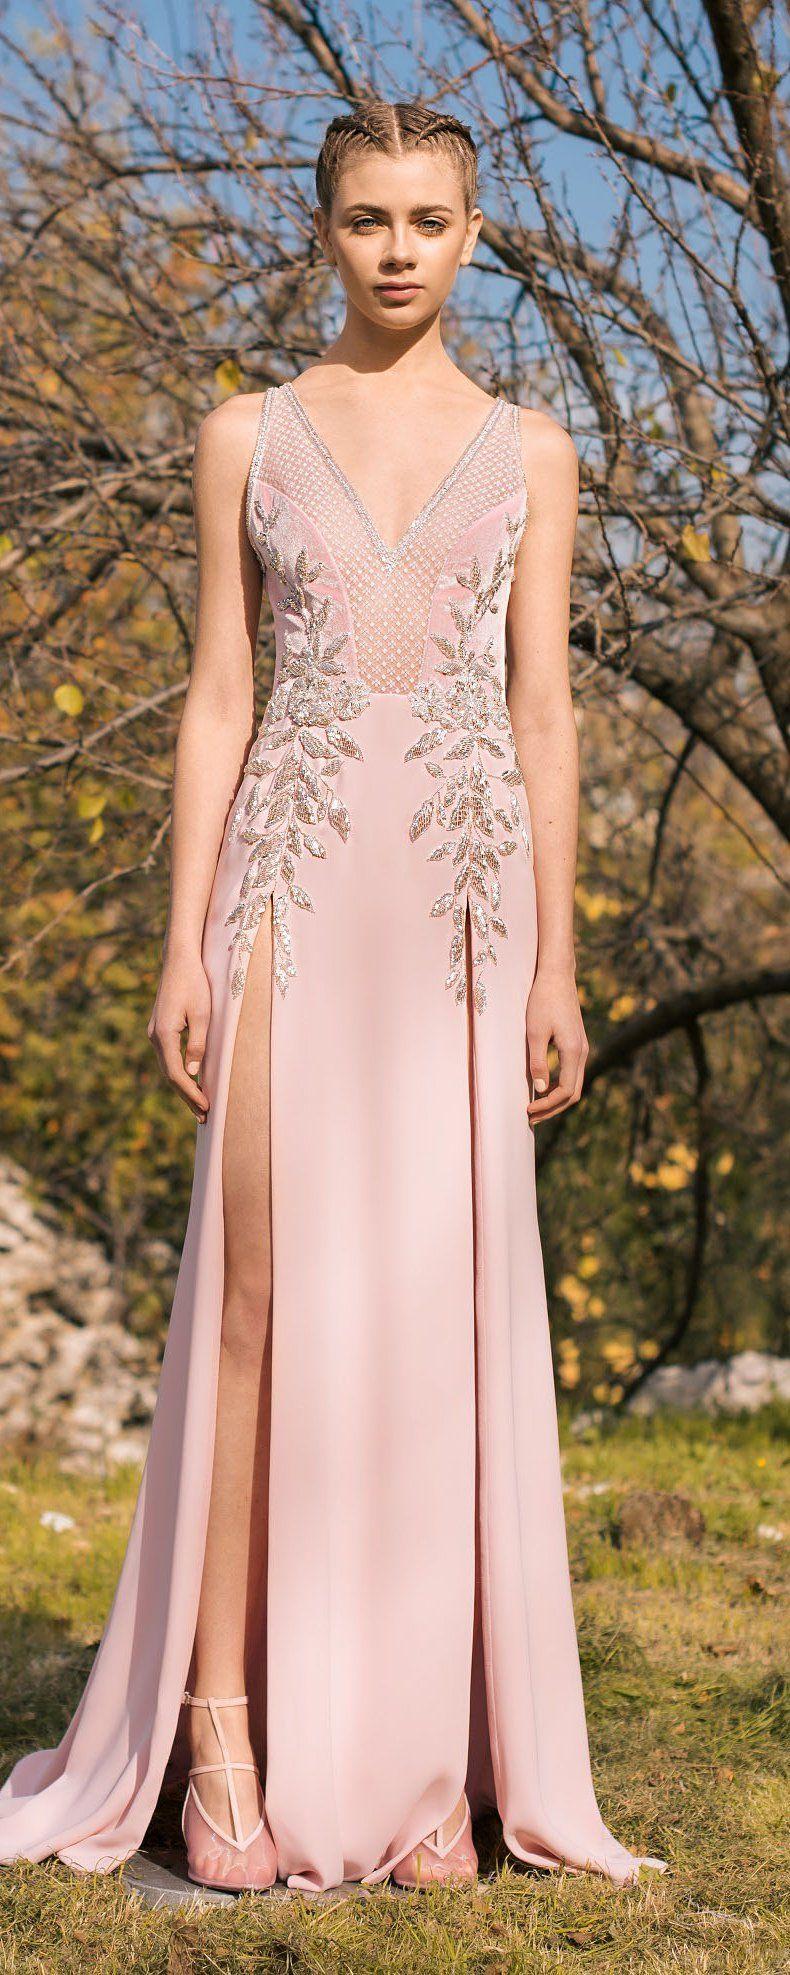 Georges Hobeika Pre-Fall 2018 - Ready-to-Wear | Dresses | Pinterest ...